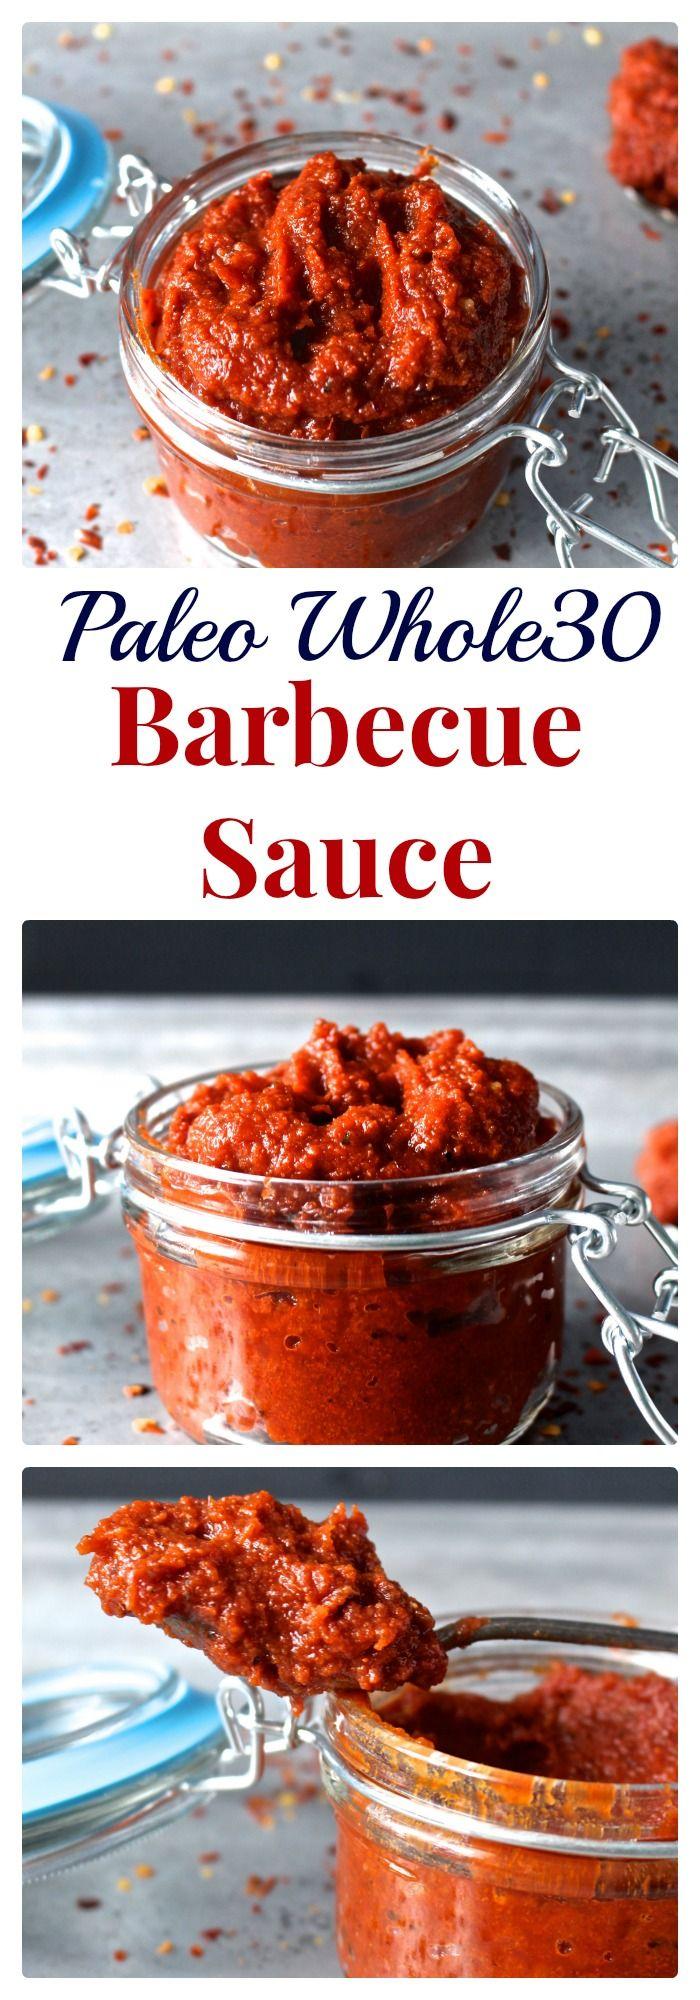 Paleo Whole30 Barbecue Sauce